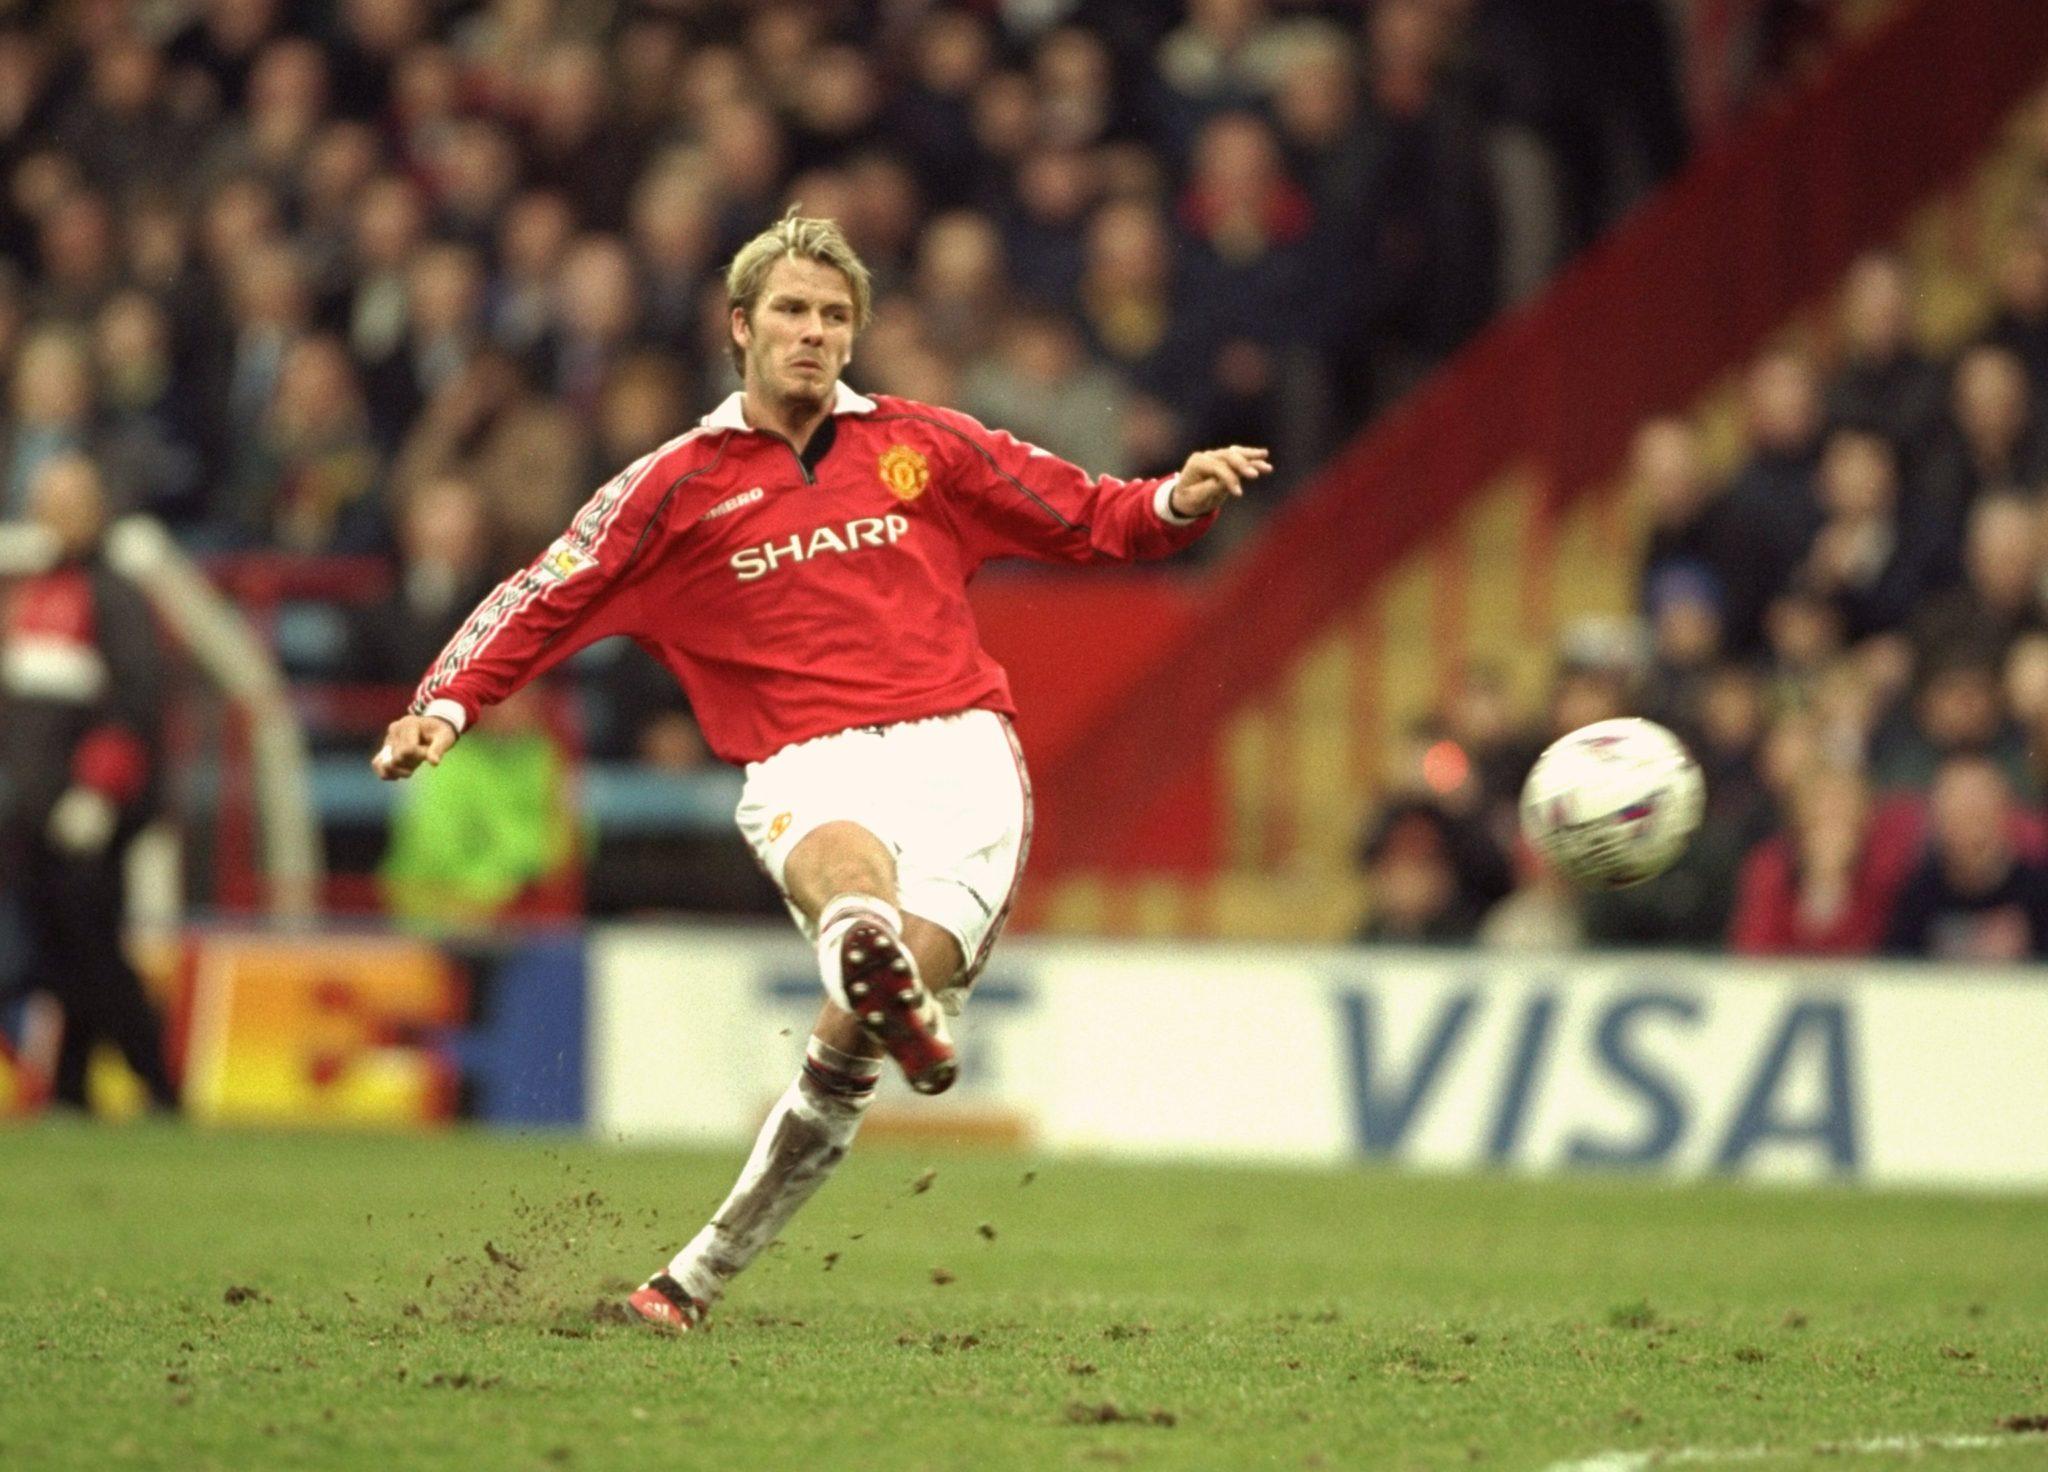 David Beckham mostró sus mejores prestaciones como futbolista en el United.